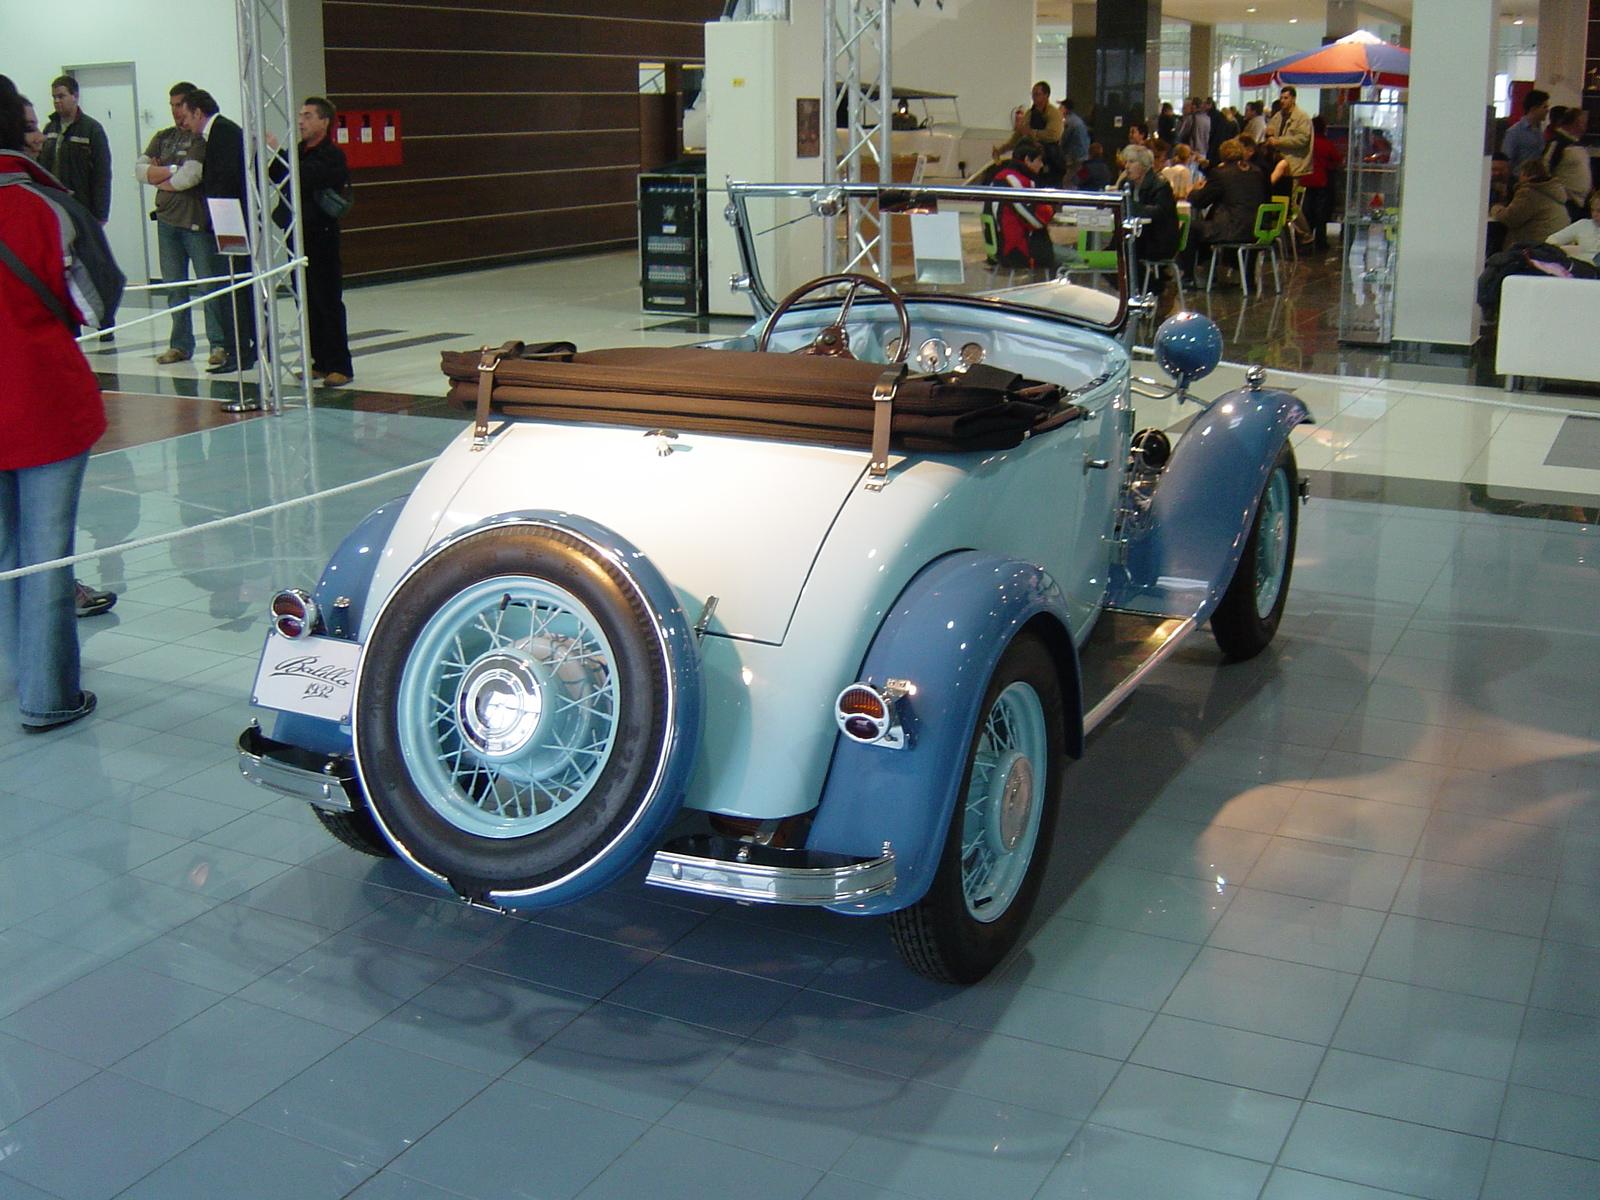 File:Oldtimer Show 2007 - 009 - 1932 Fiat 508 Balilla M Spider (rear